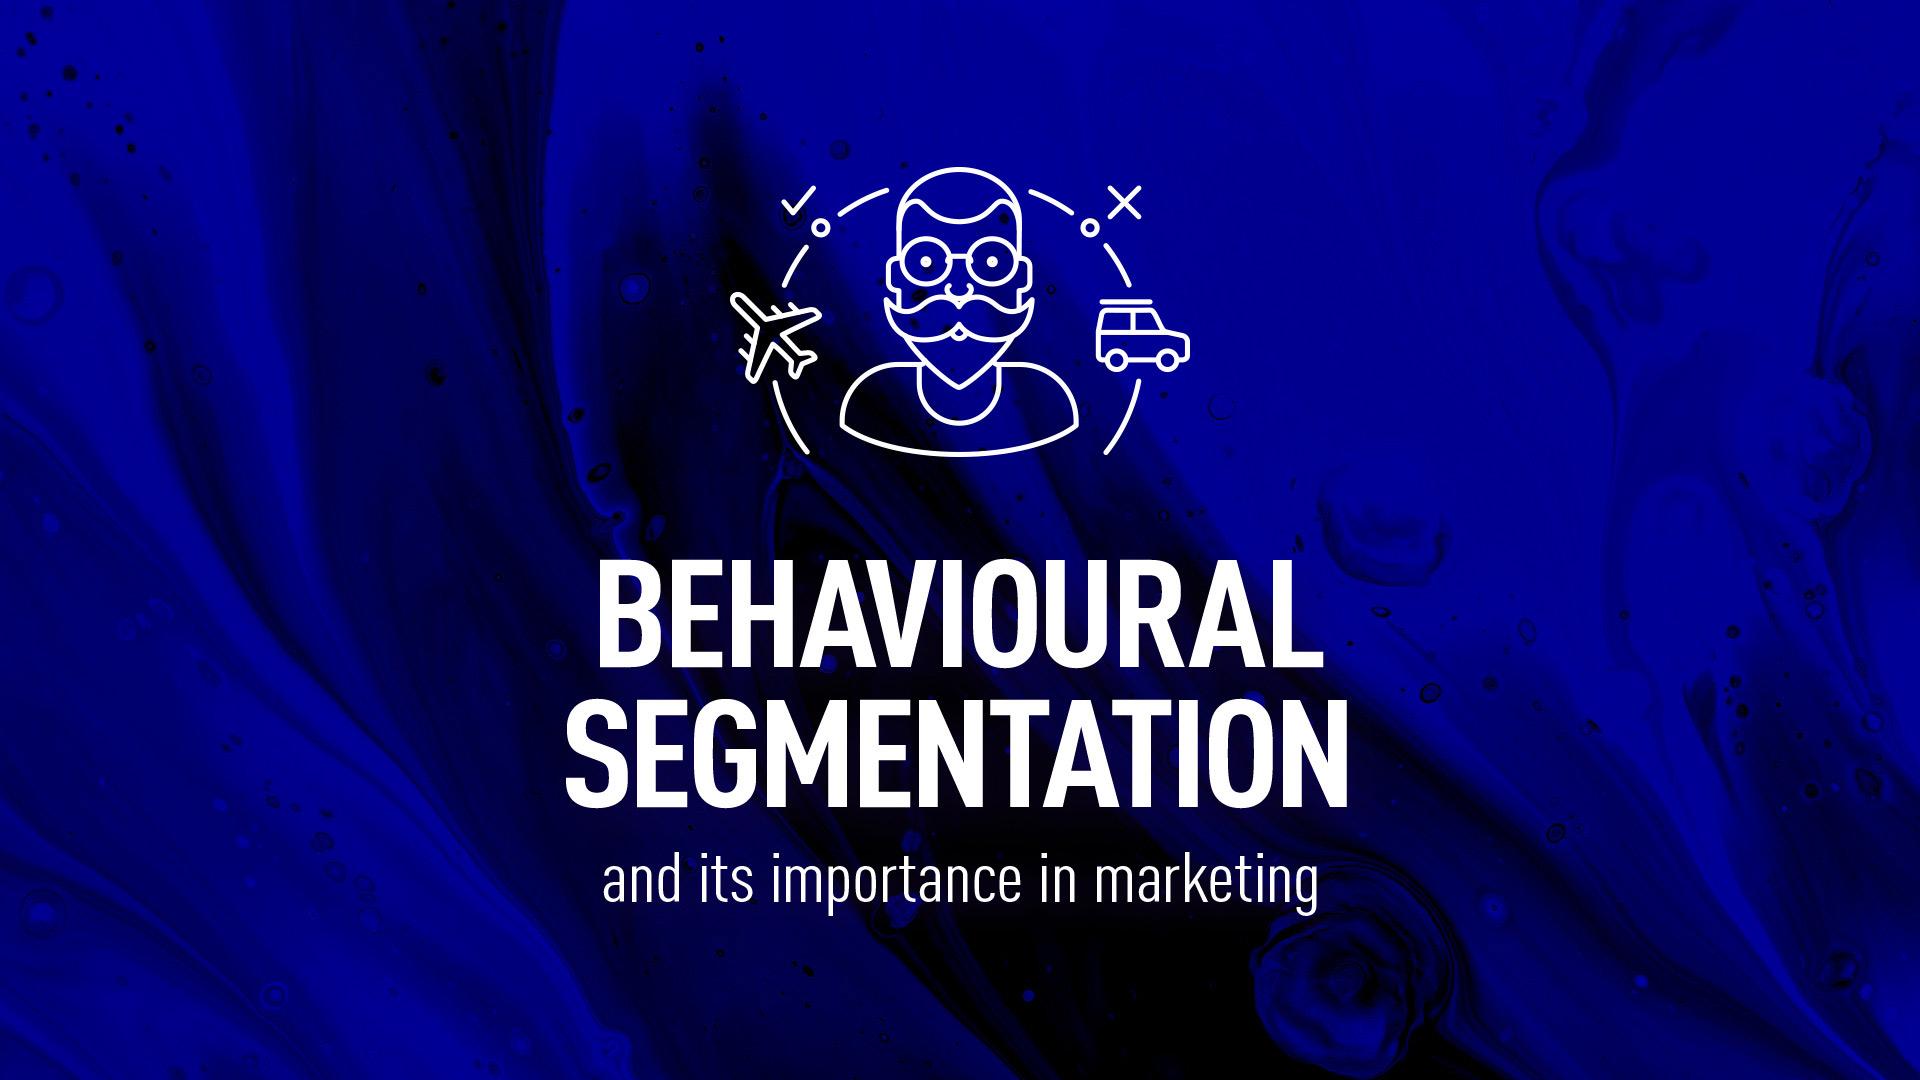 Behavioural segmentation - the importance in marketing